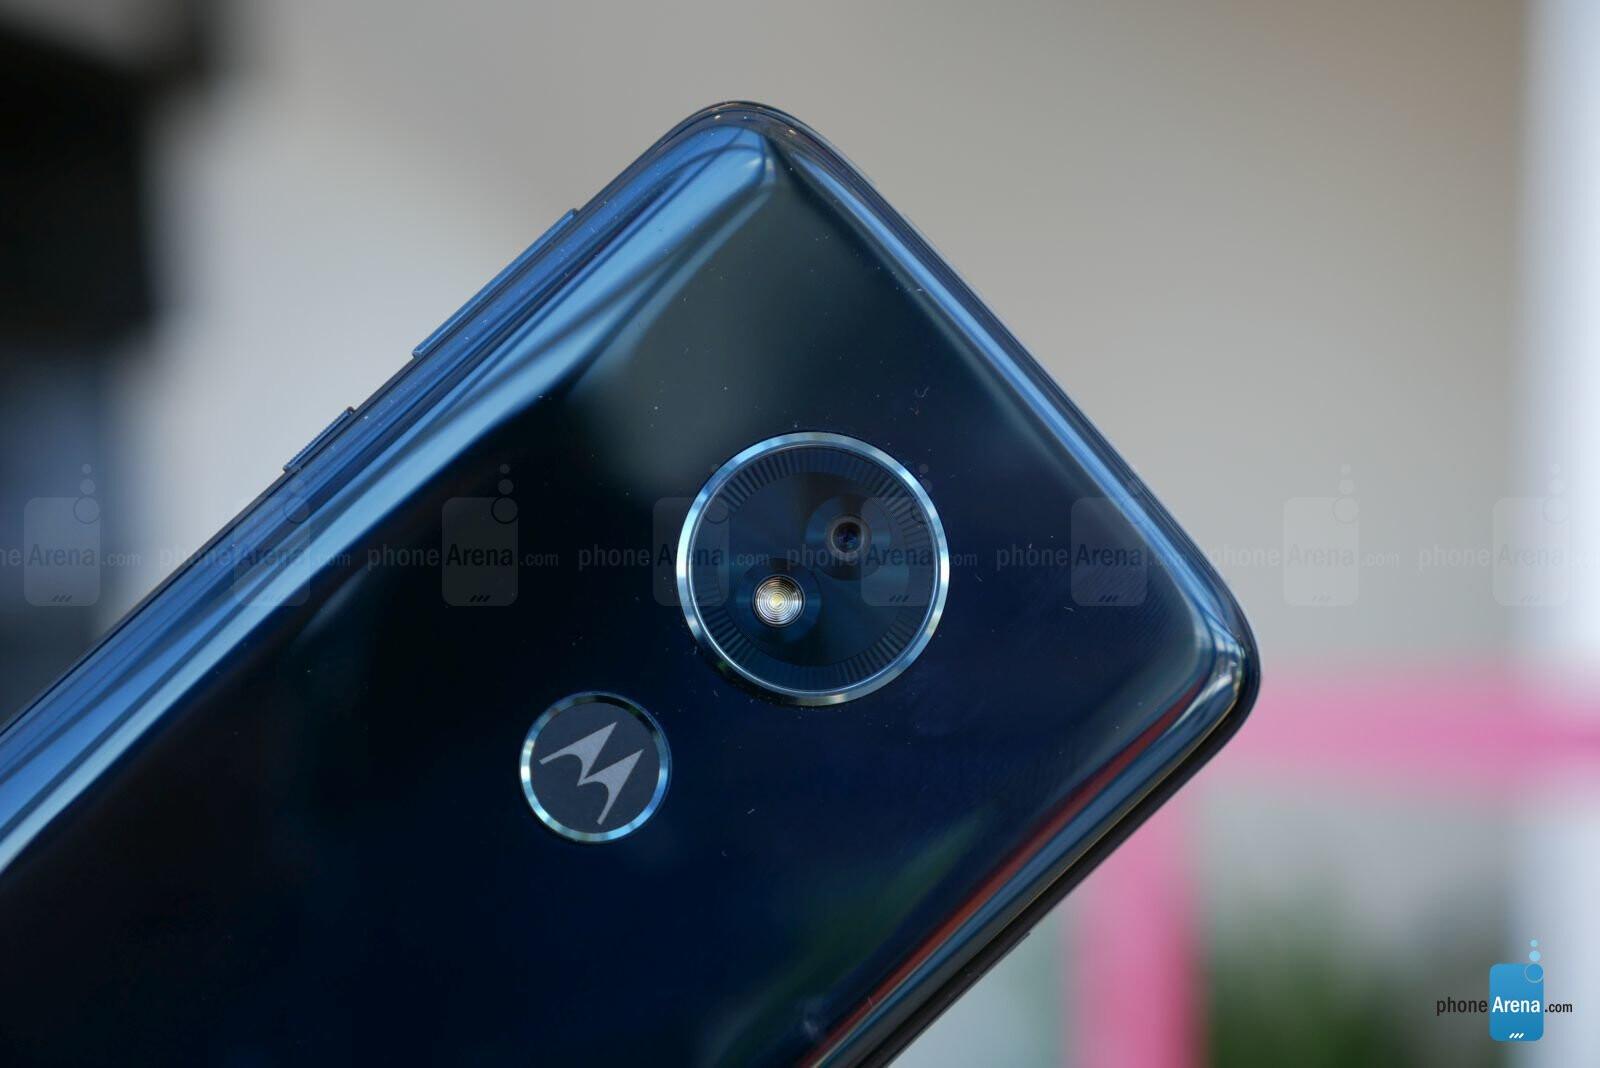 Motorola Moto G6 & G6 Play hands-on | PhoneArena reviews